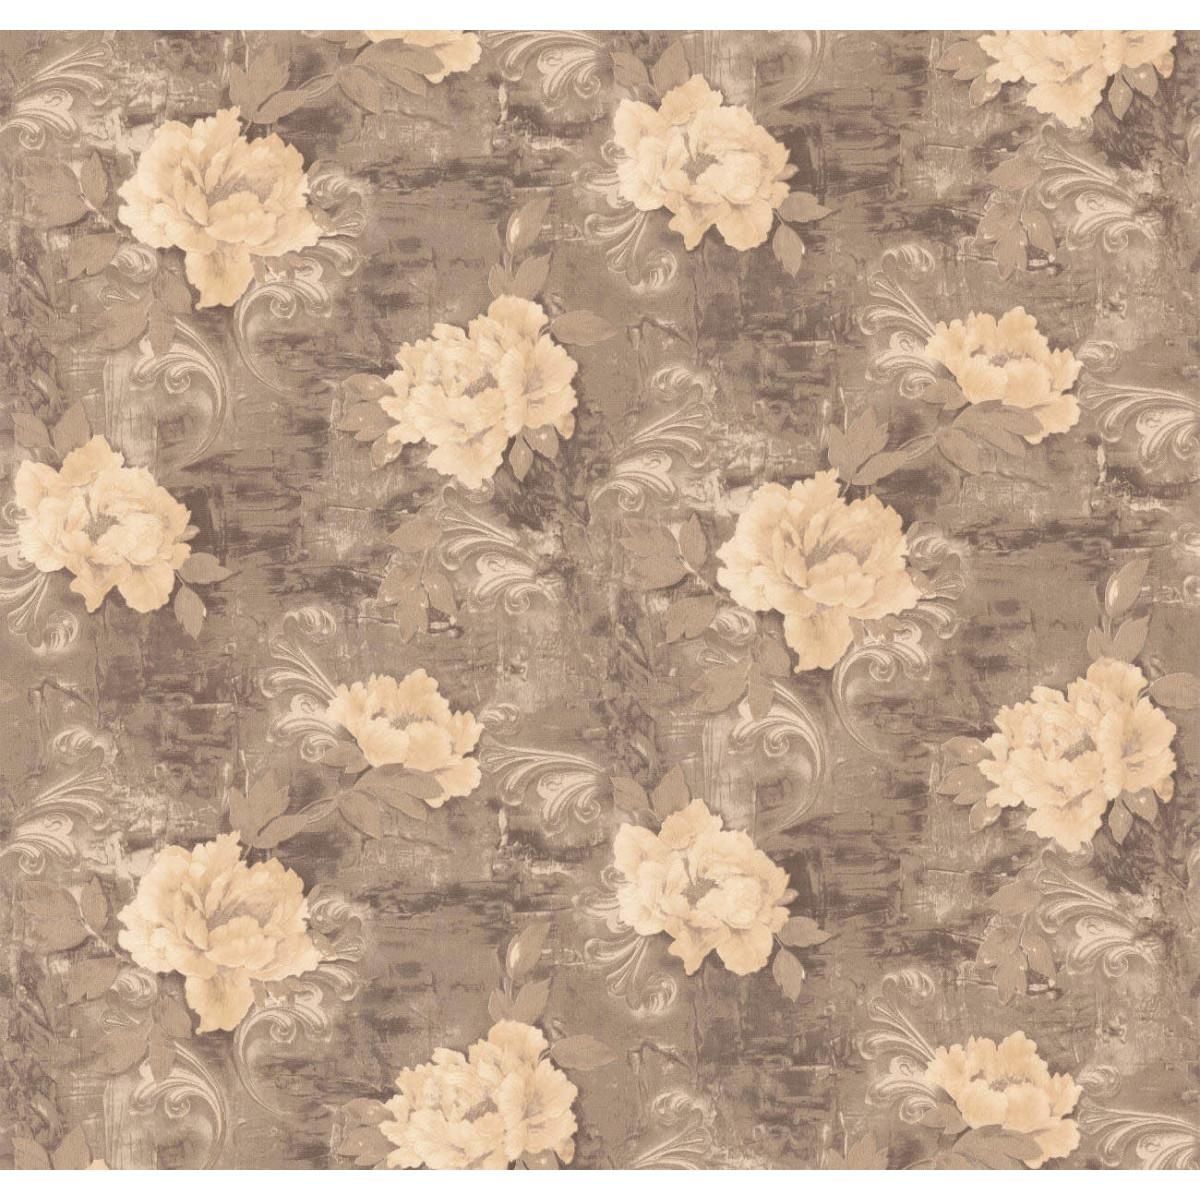 Обои флизелиновые Мир Авангард Decorato коричневые 1.06 м 45-119-01